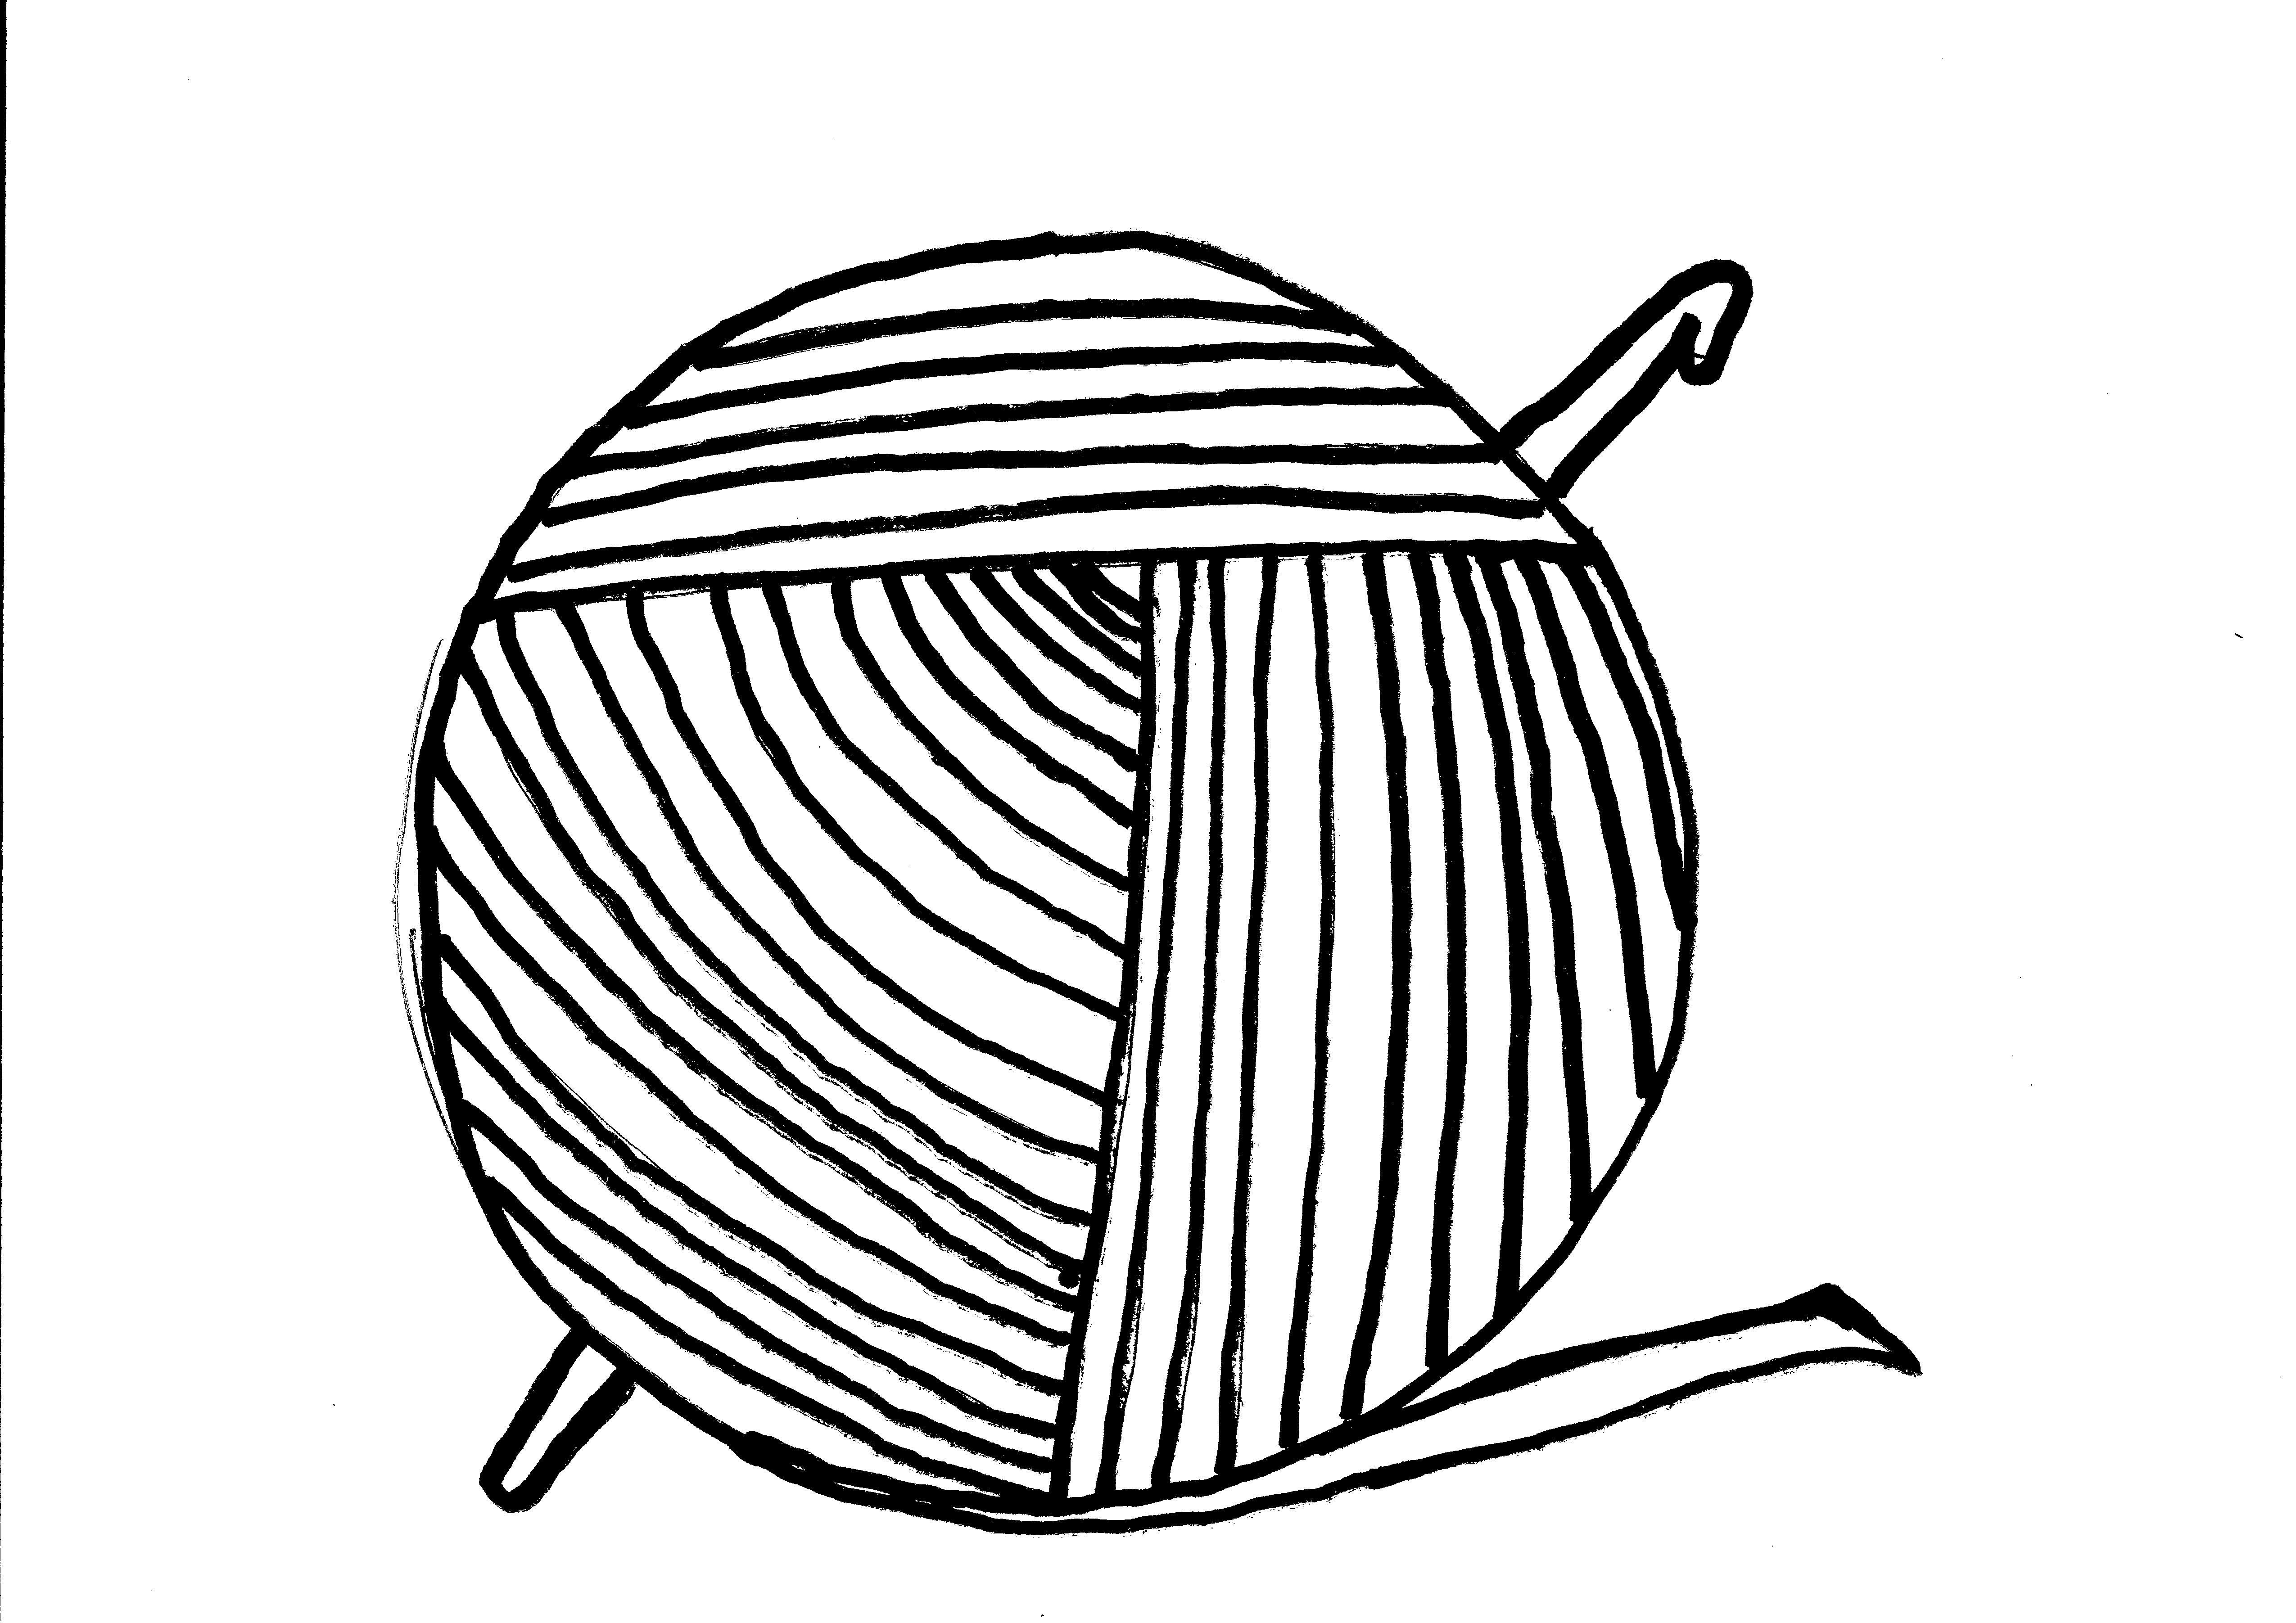 yarn ball and crochet hook free image